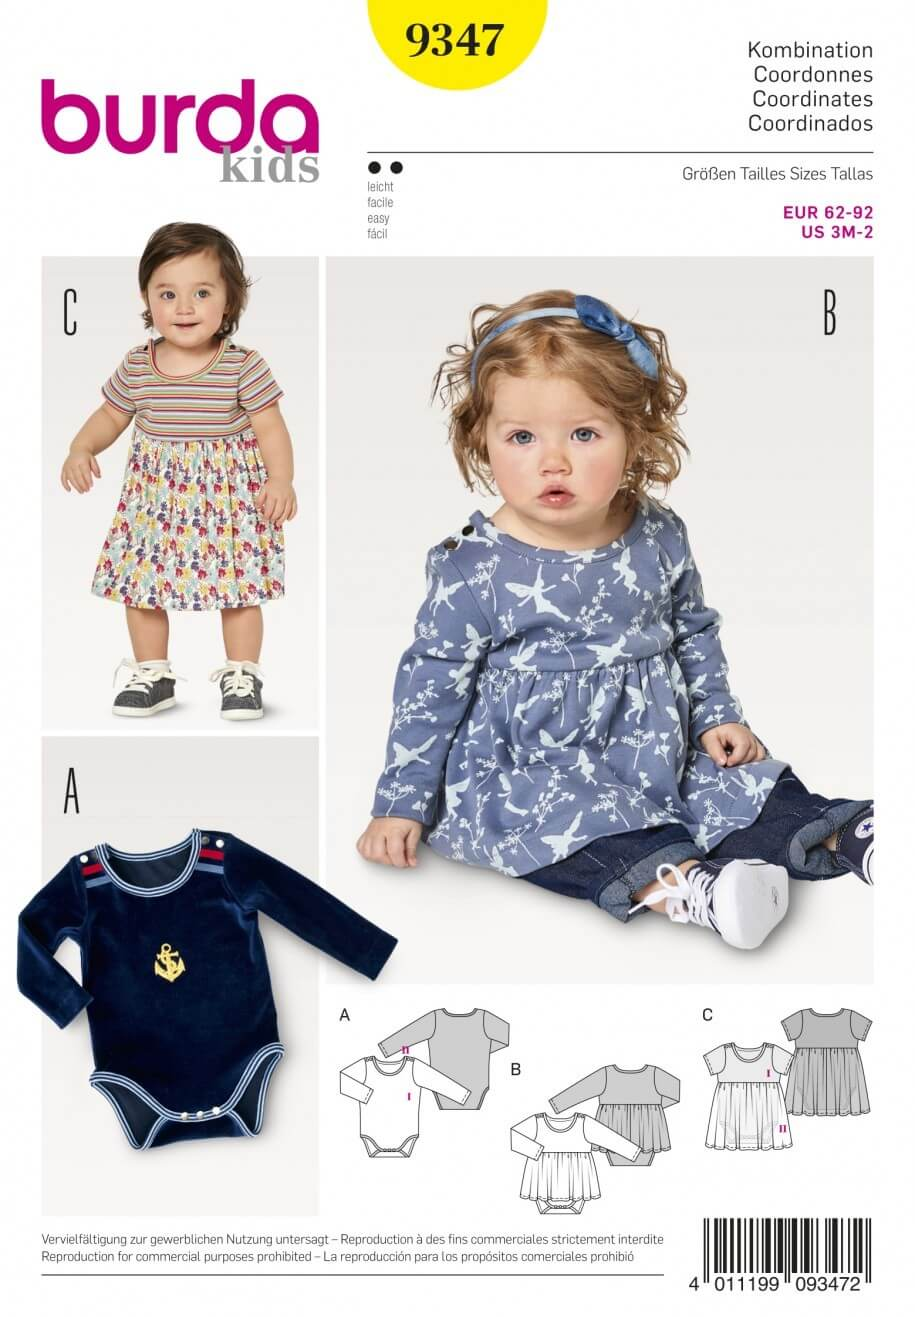 Burda Kids Baby Bodysuit With Optional Pleated Skirt Sewing Pattern 9347